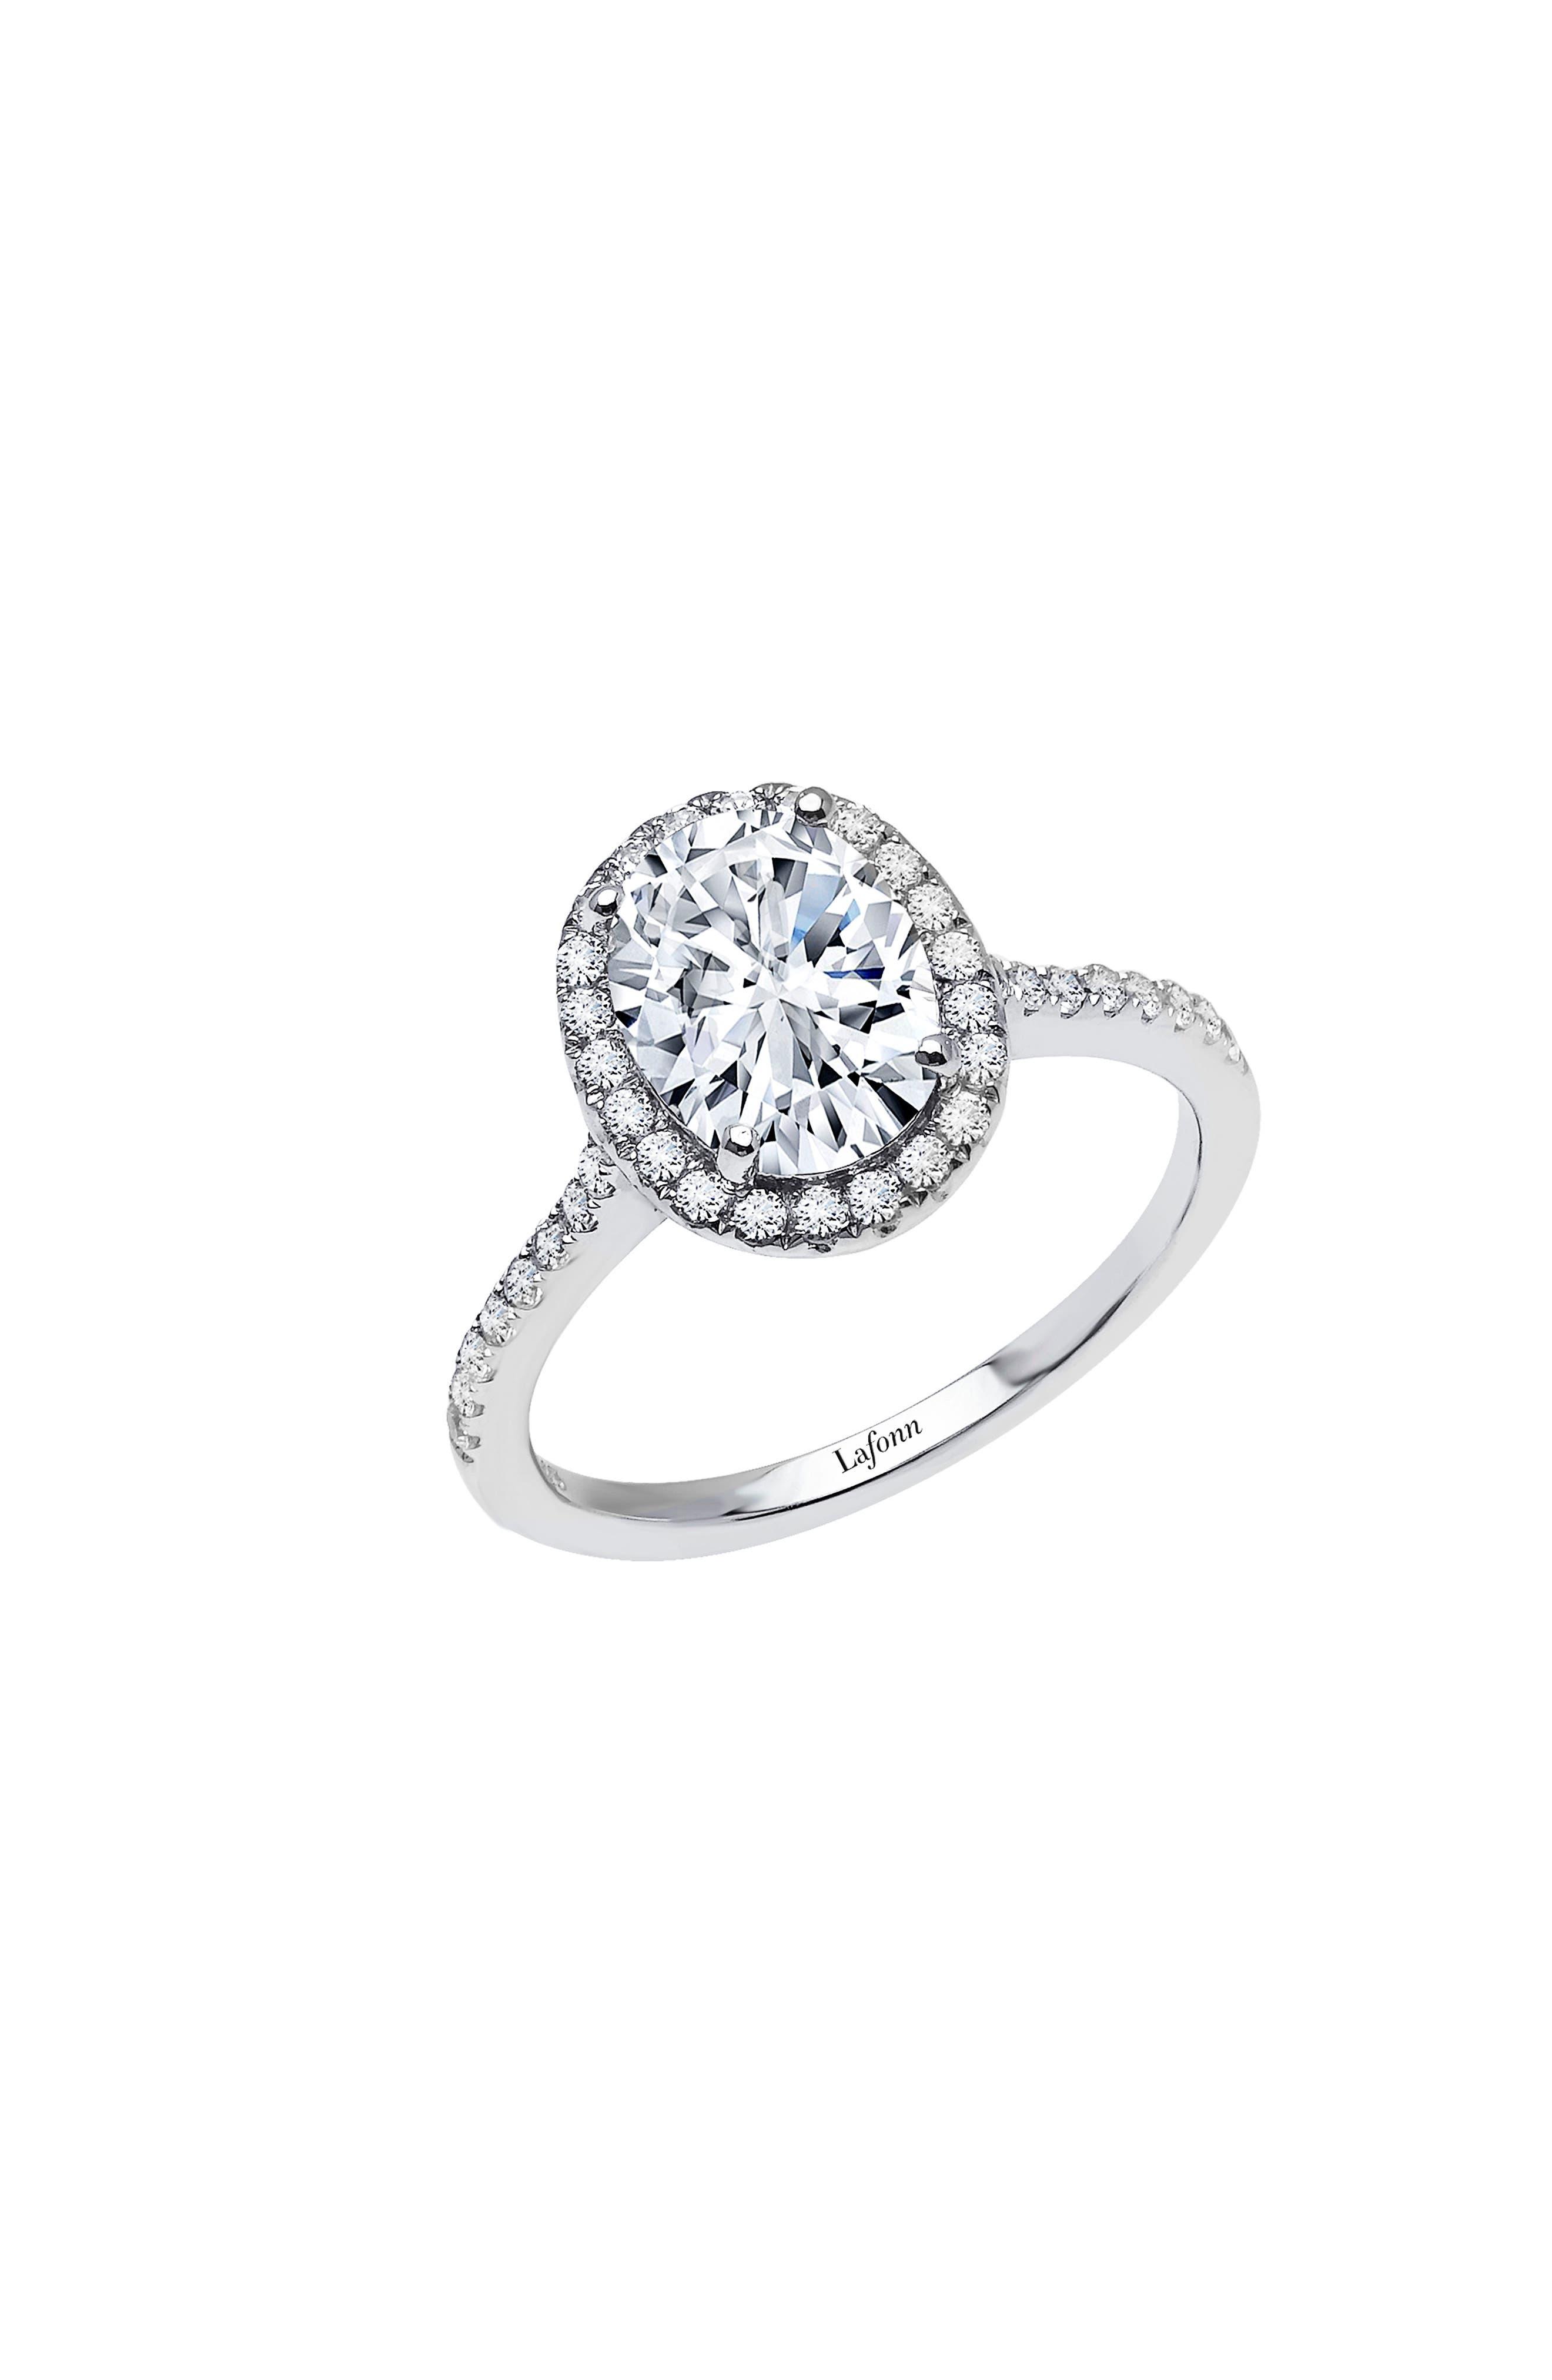 Oval Simulated Diamond Halo Ring